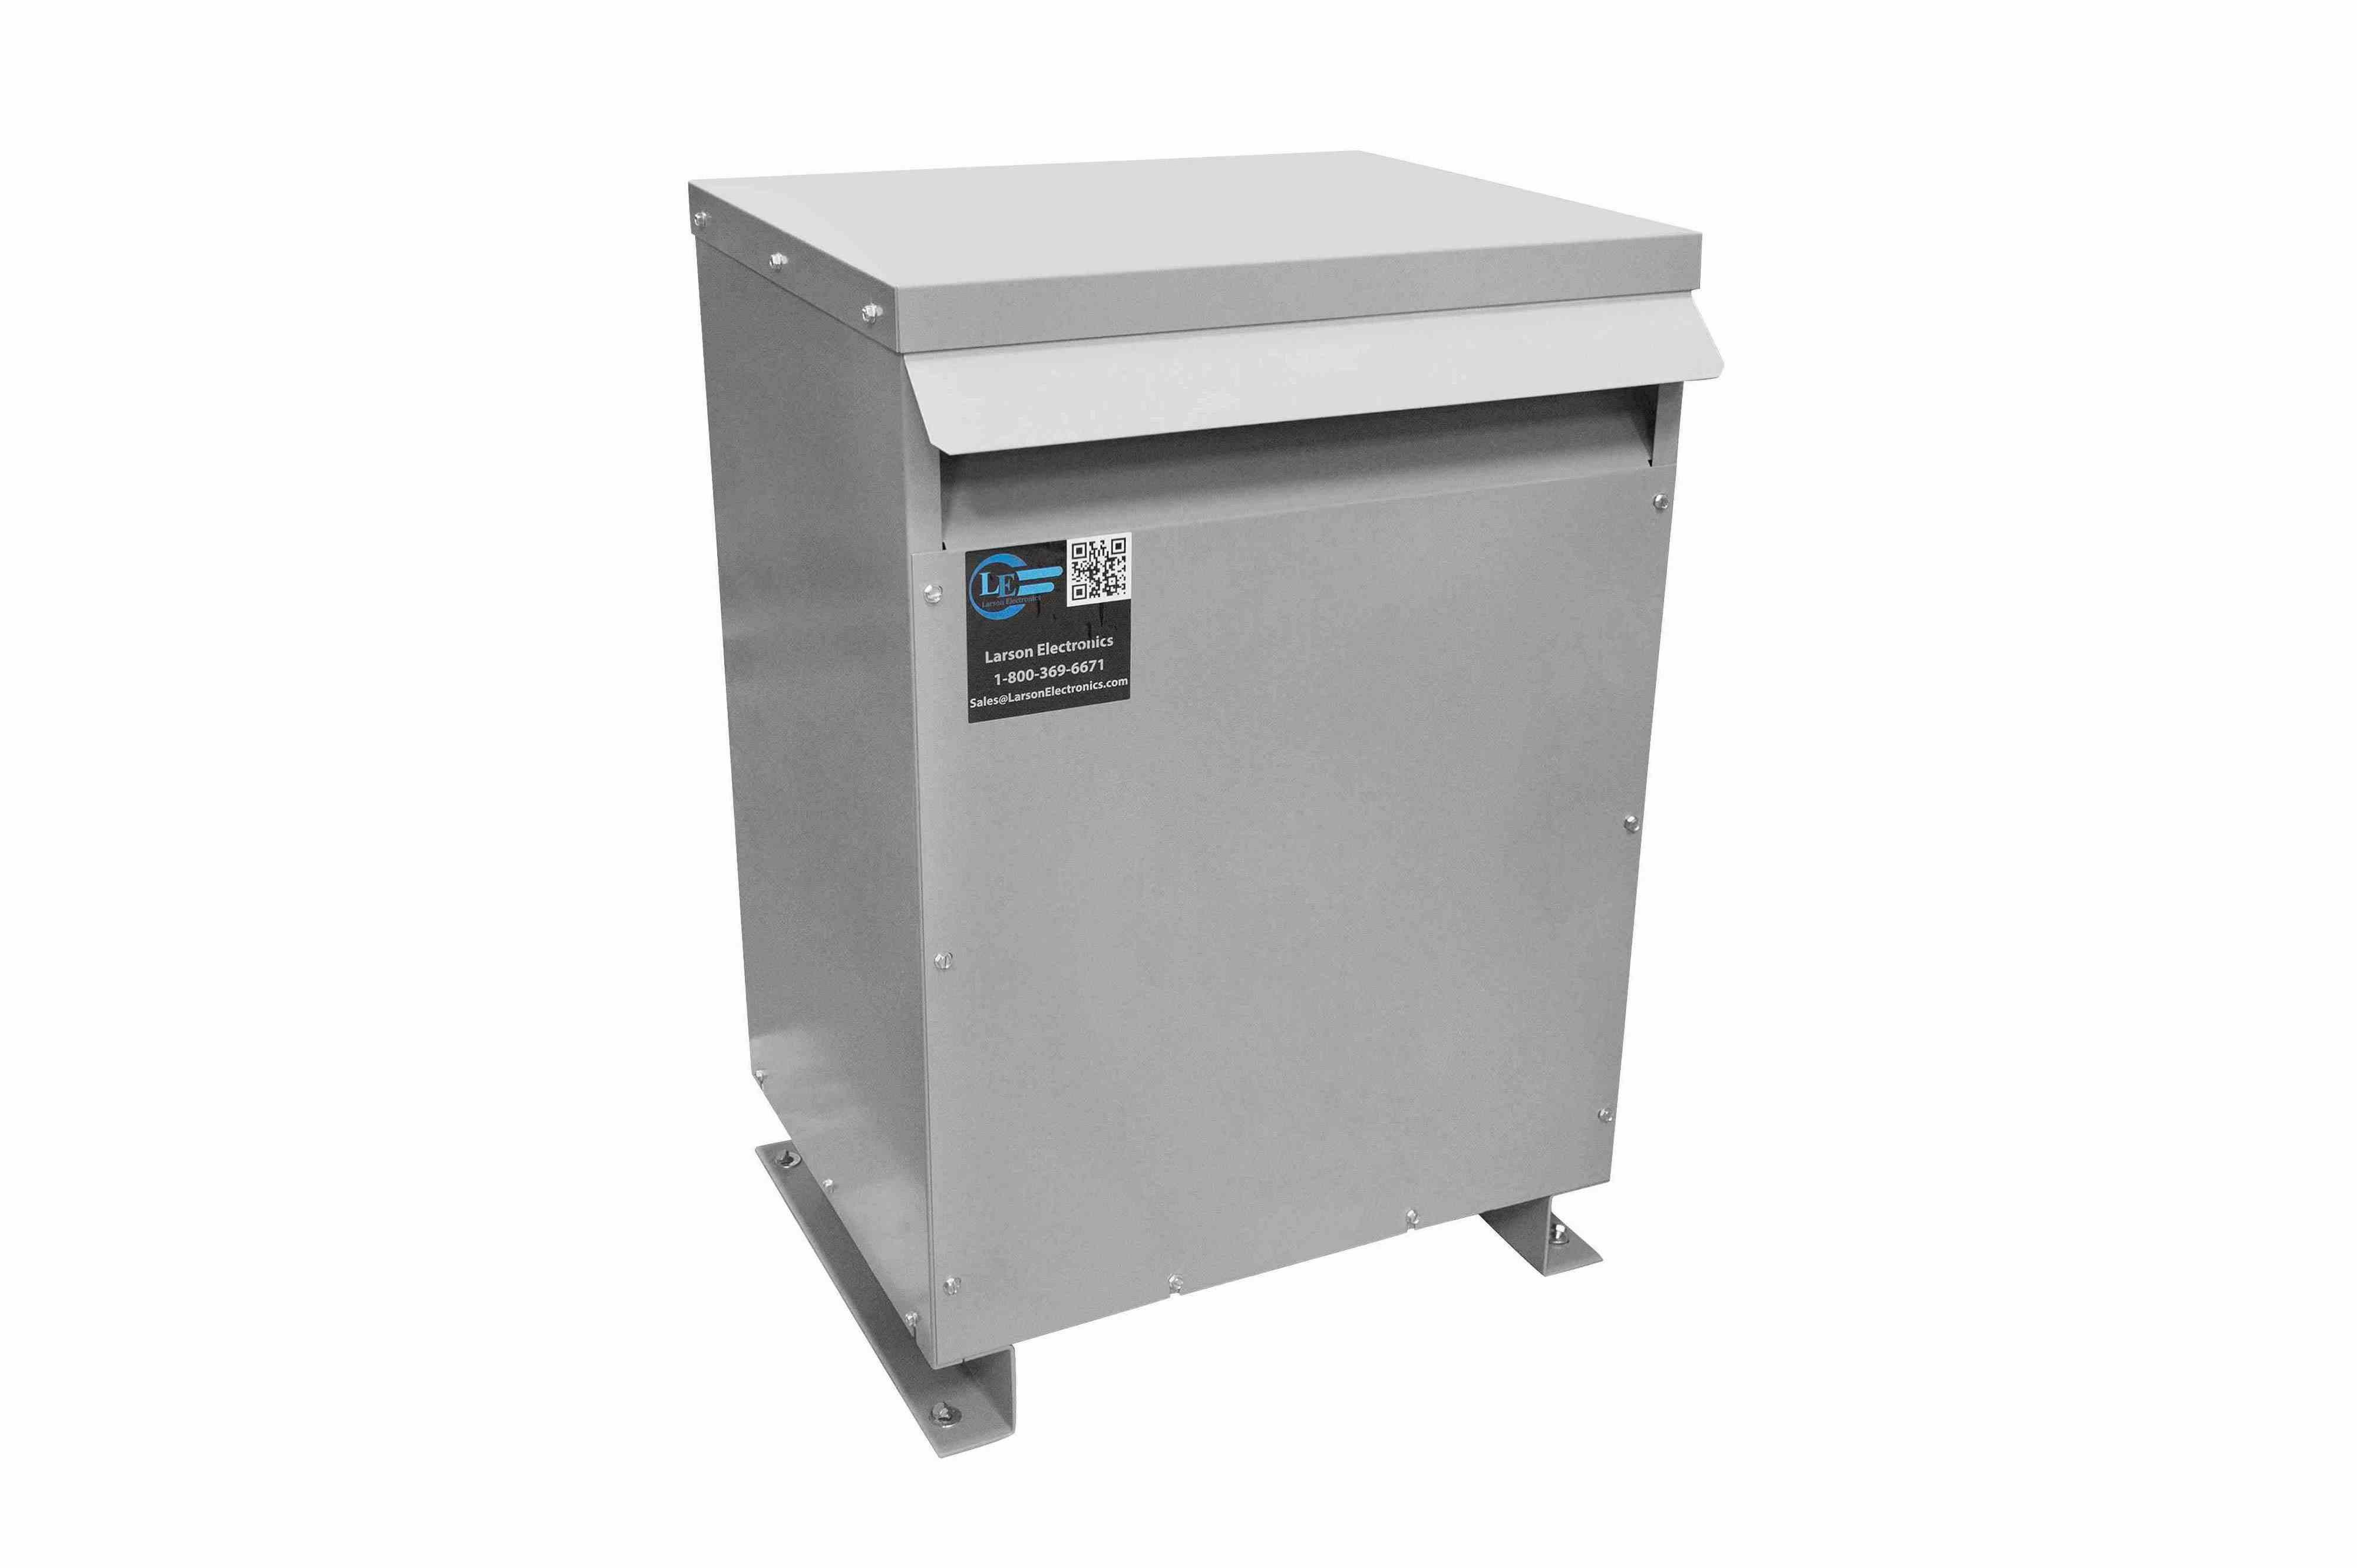 95 kVA 3PH DOE Transformer, 480V Delta Primary, 208Y/120 Wye-N Secondary, N3R, Ventilated, 60 Hz